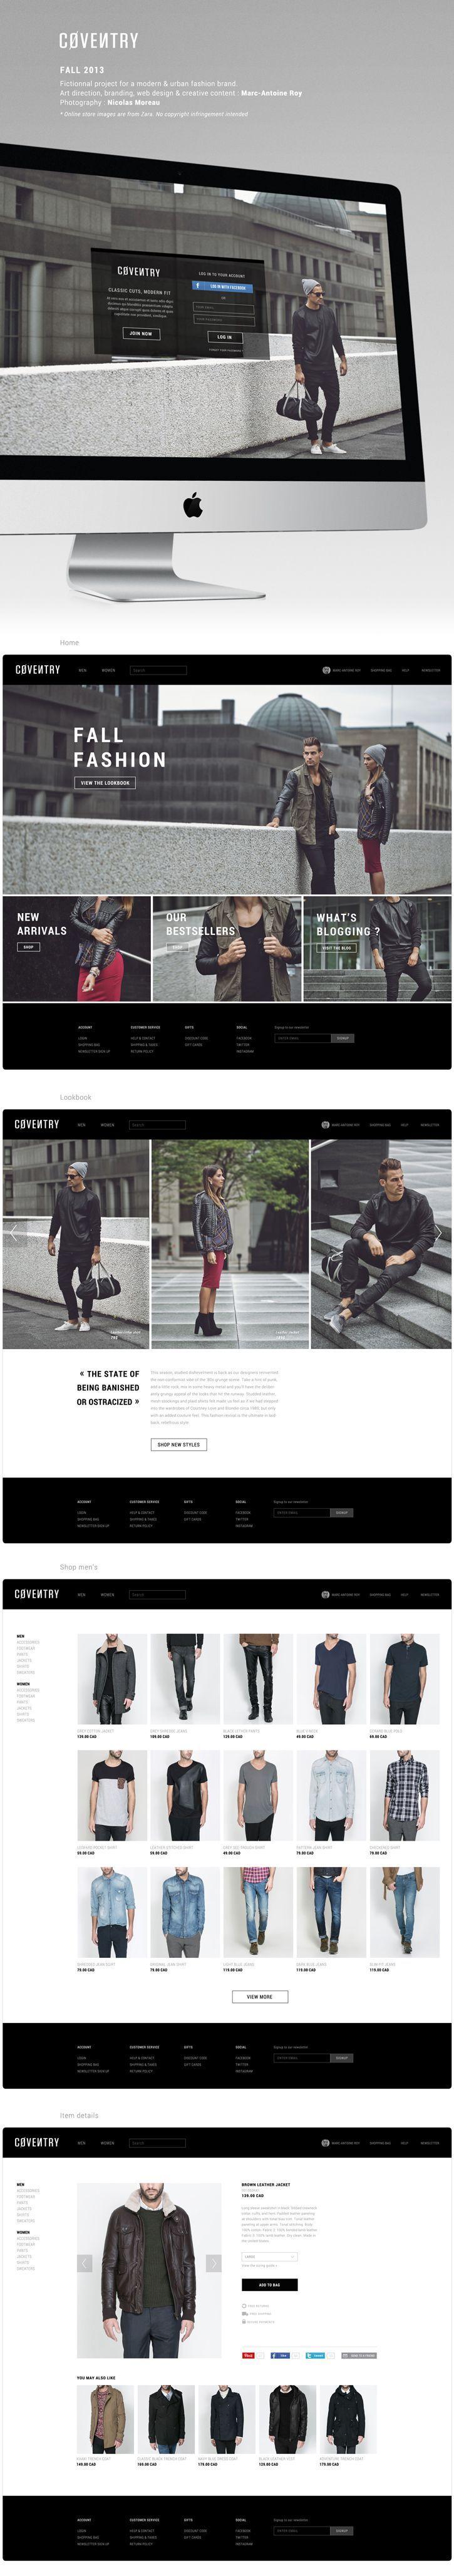 25 Inspiring Website Designs   From up North